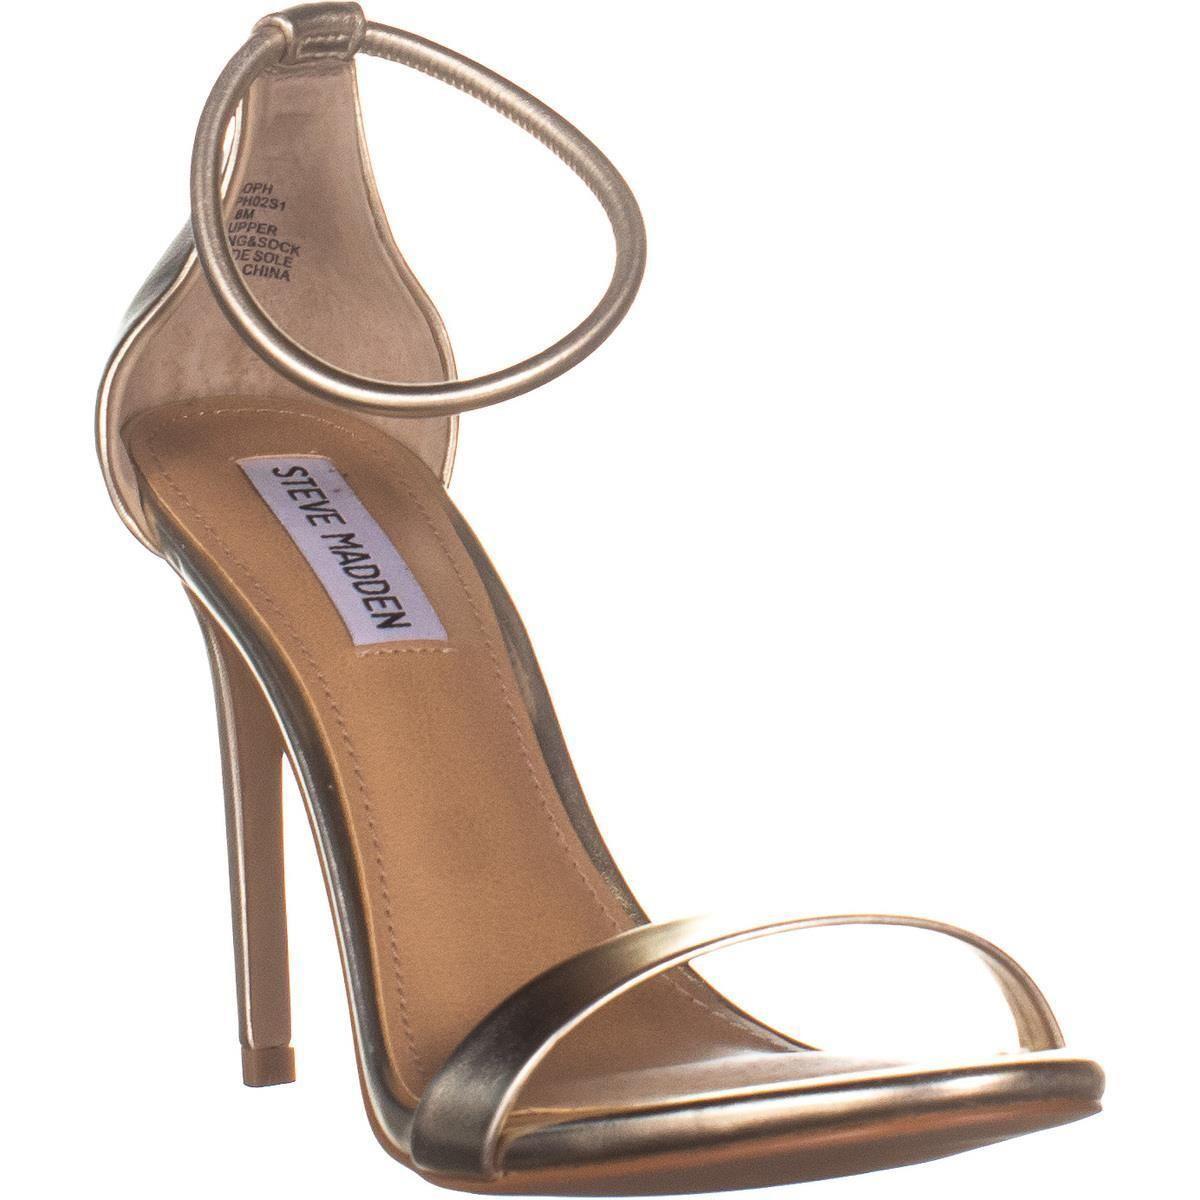 285ee2d2f73 Steve Madden. Women s Soph Ankle Strap Heels